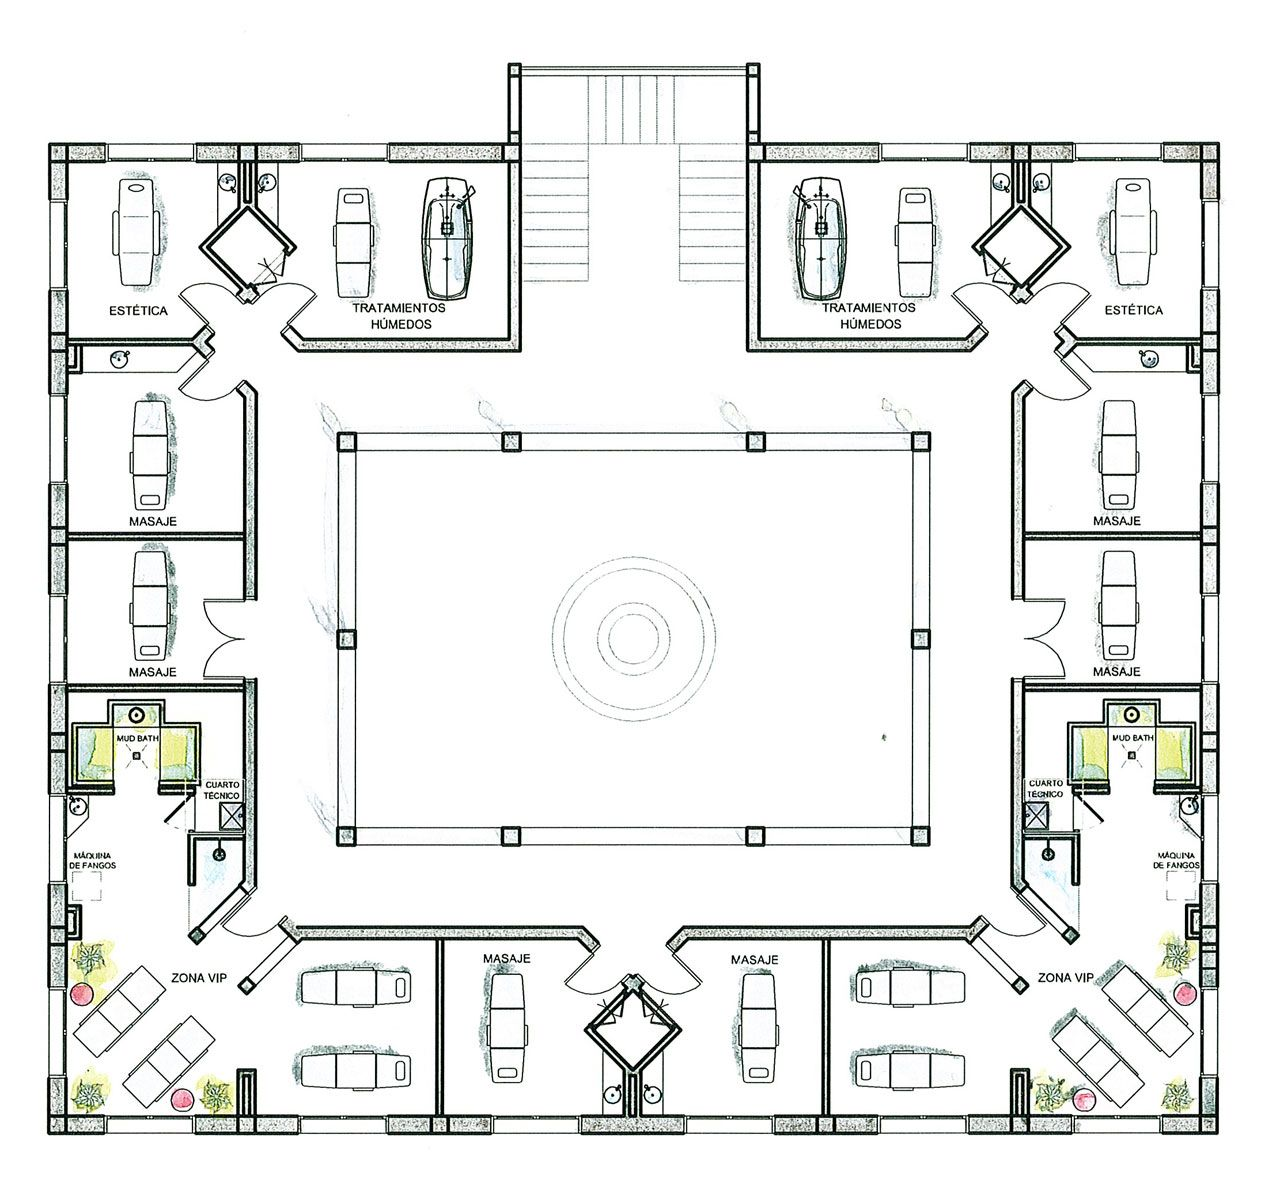 Proyectos destacados majestic elegance planos for Planos de oficinas pequenas